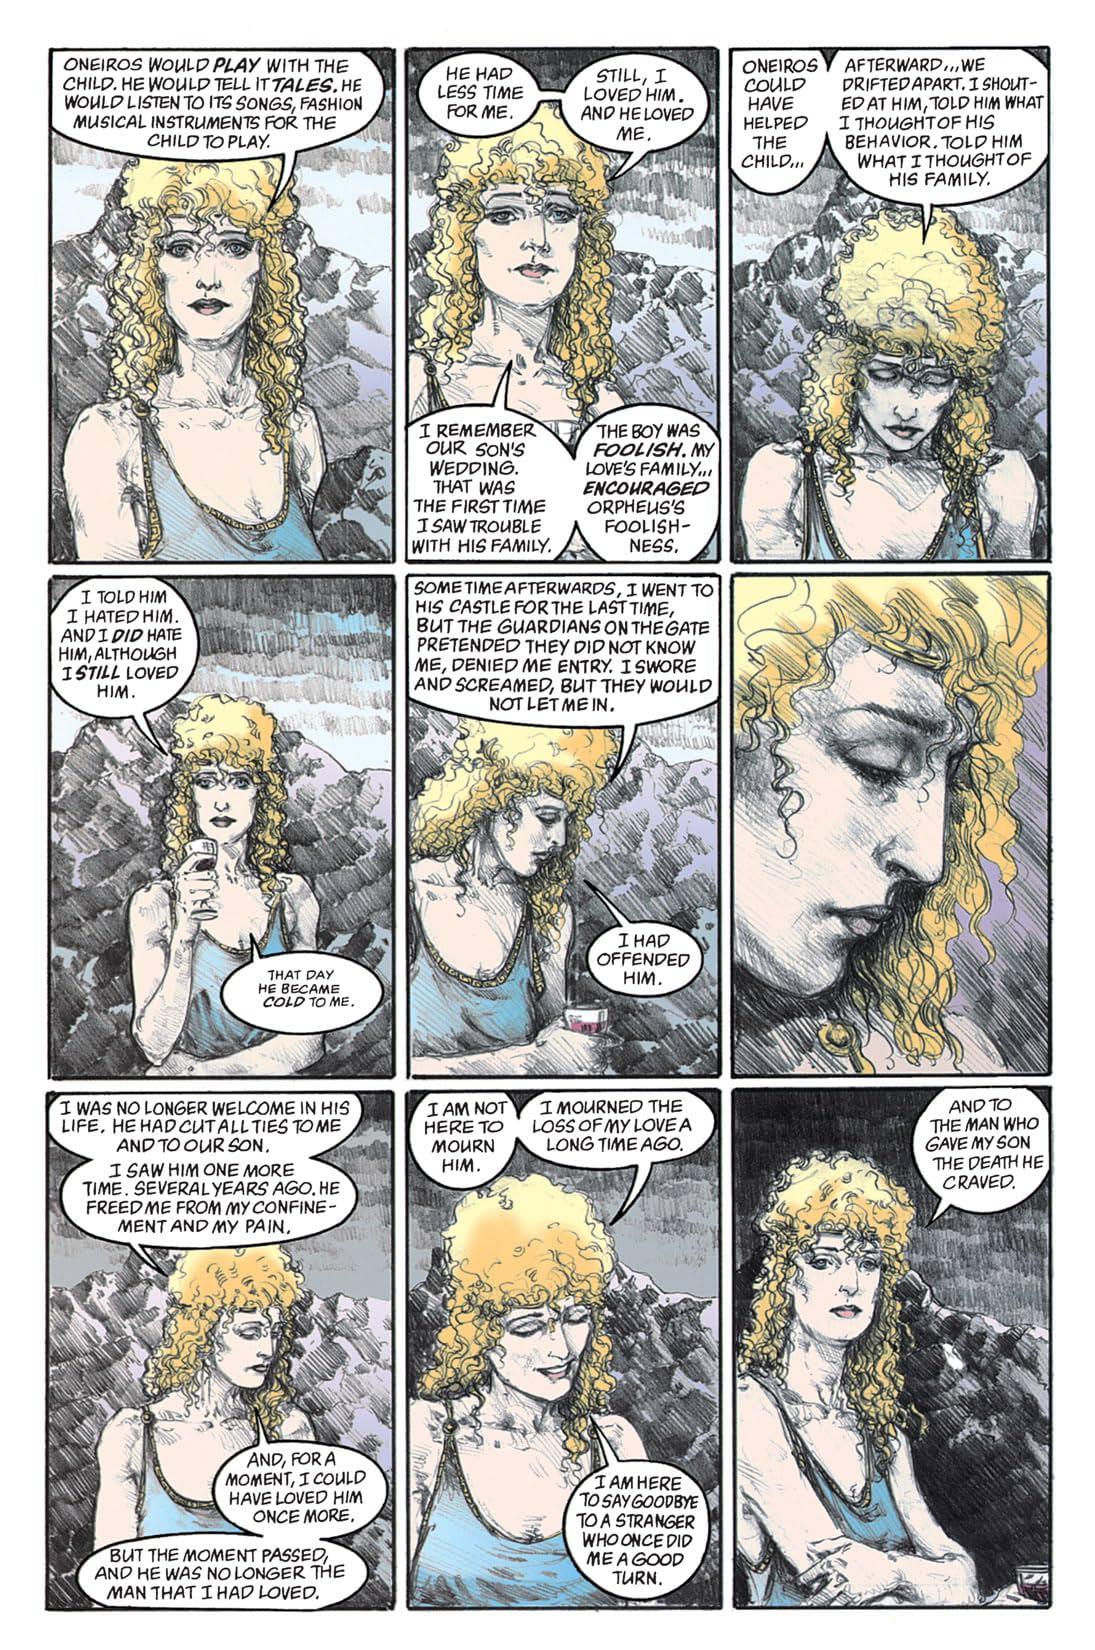 The Sandman #71